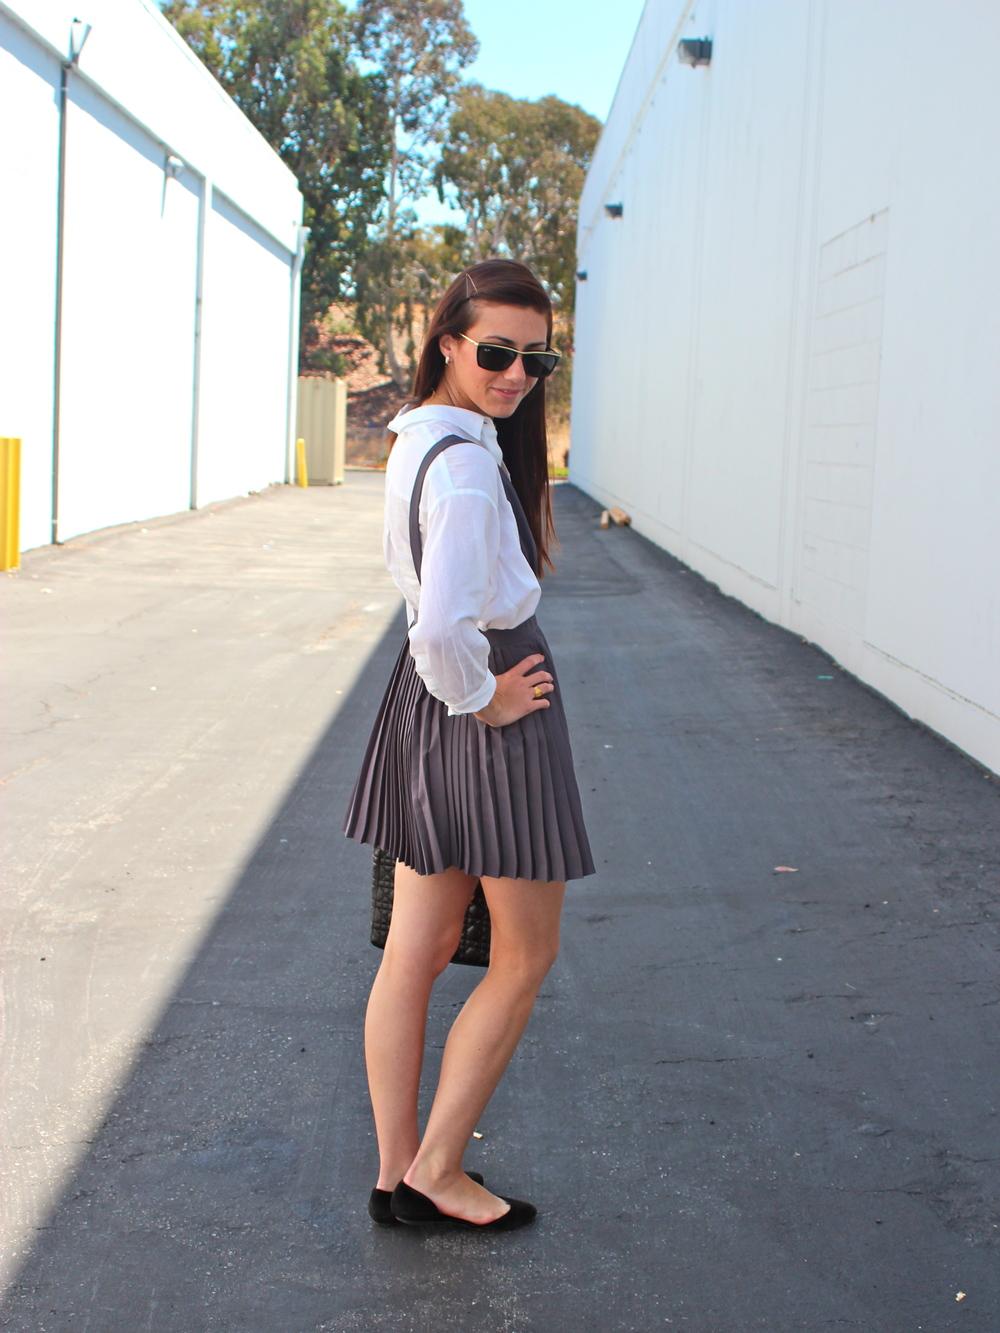 Dress: Forever21; Blouse: Elizabeth and James; Shoes: Dolce Vita; Bag: Vintage; Sunnies: Ray Ban, vintage 1980s; Necklace: Stella & Dot